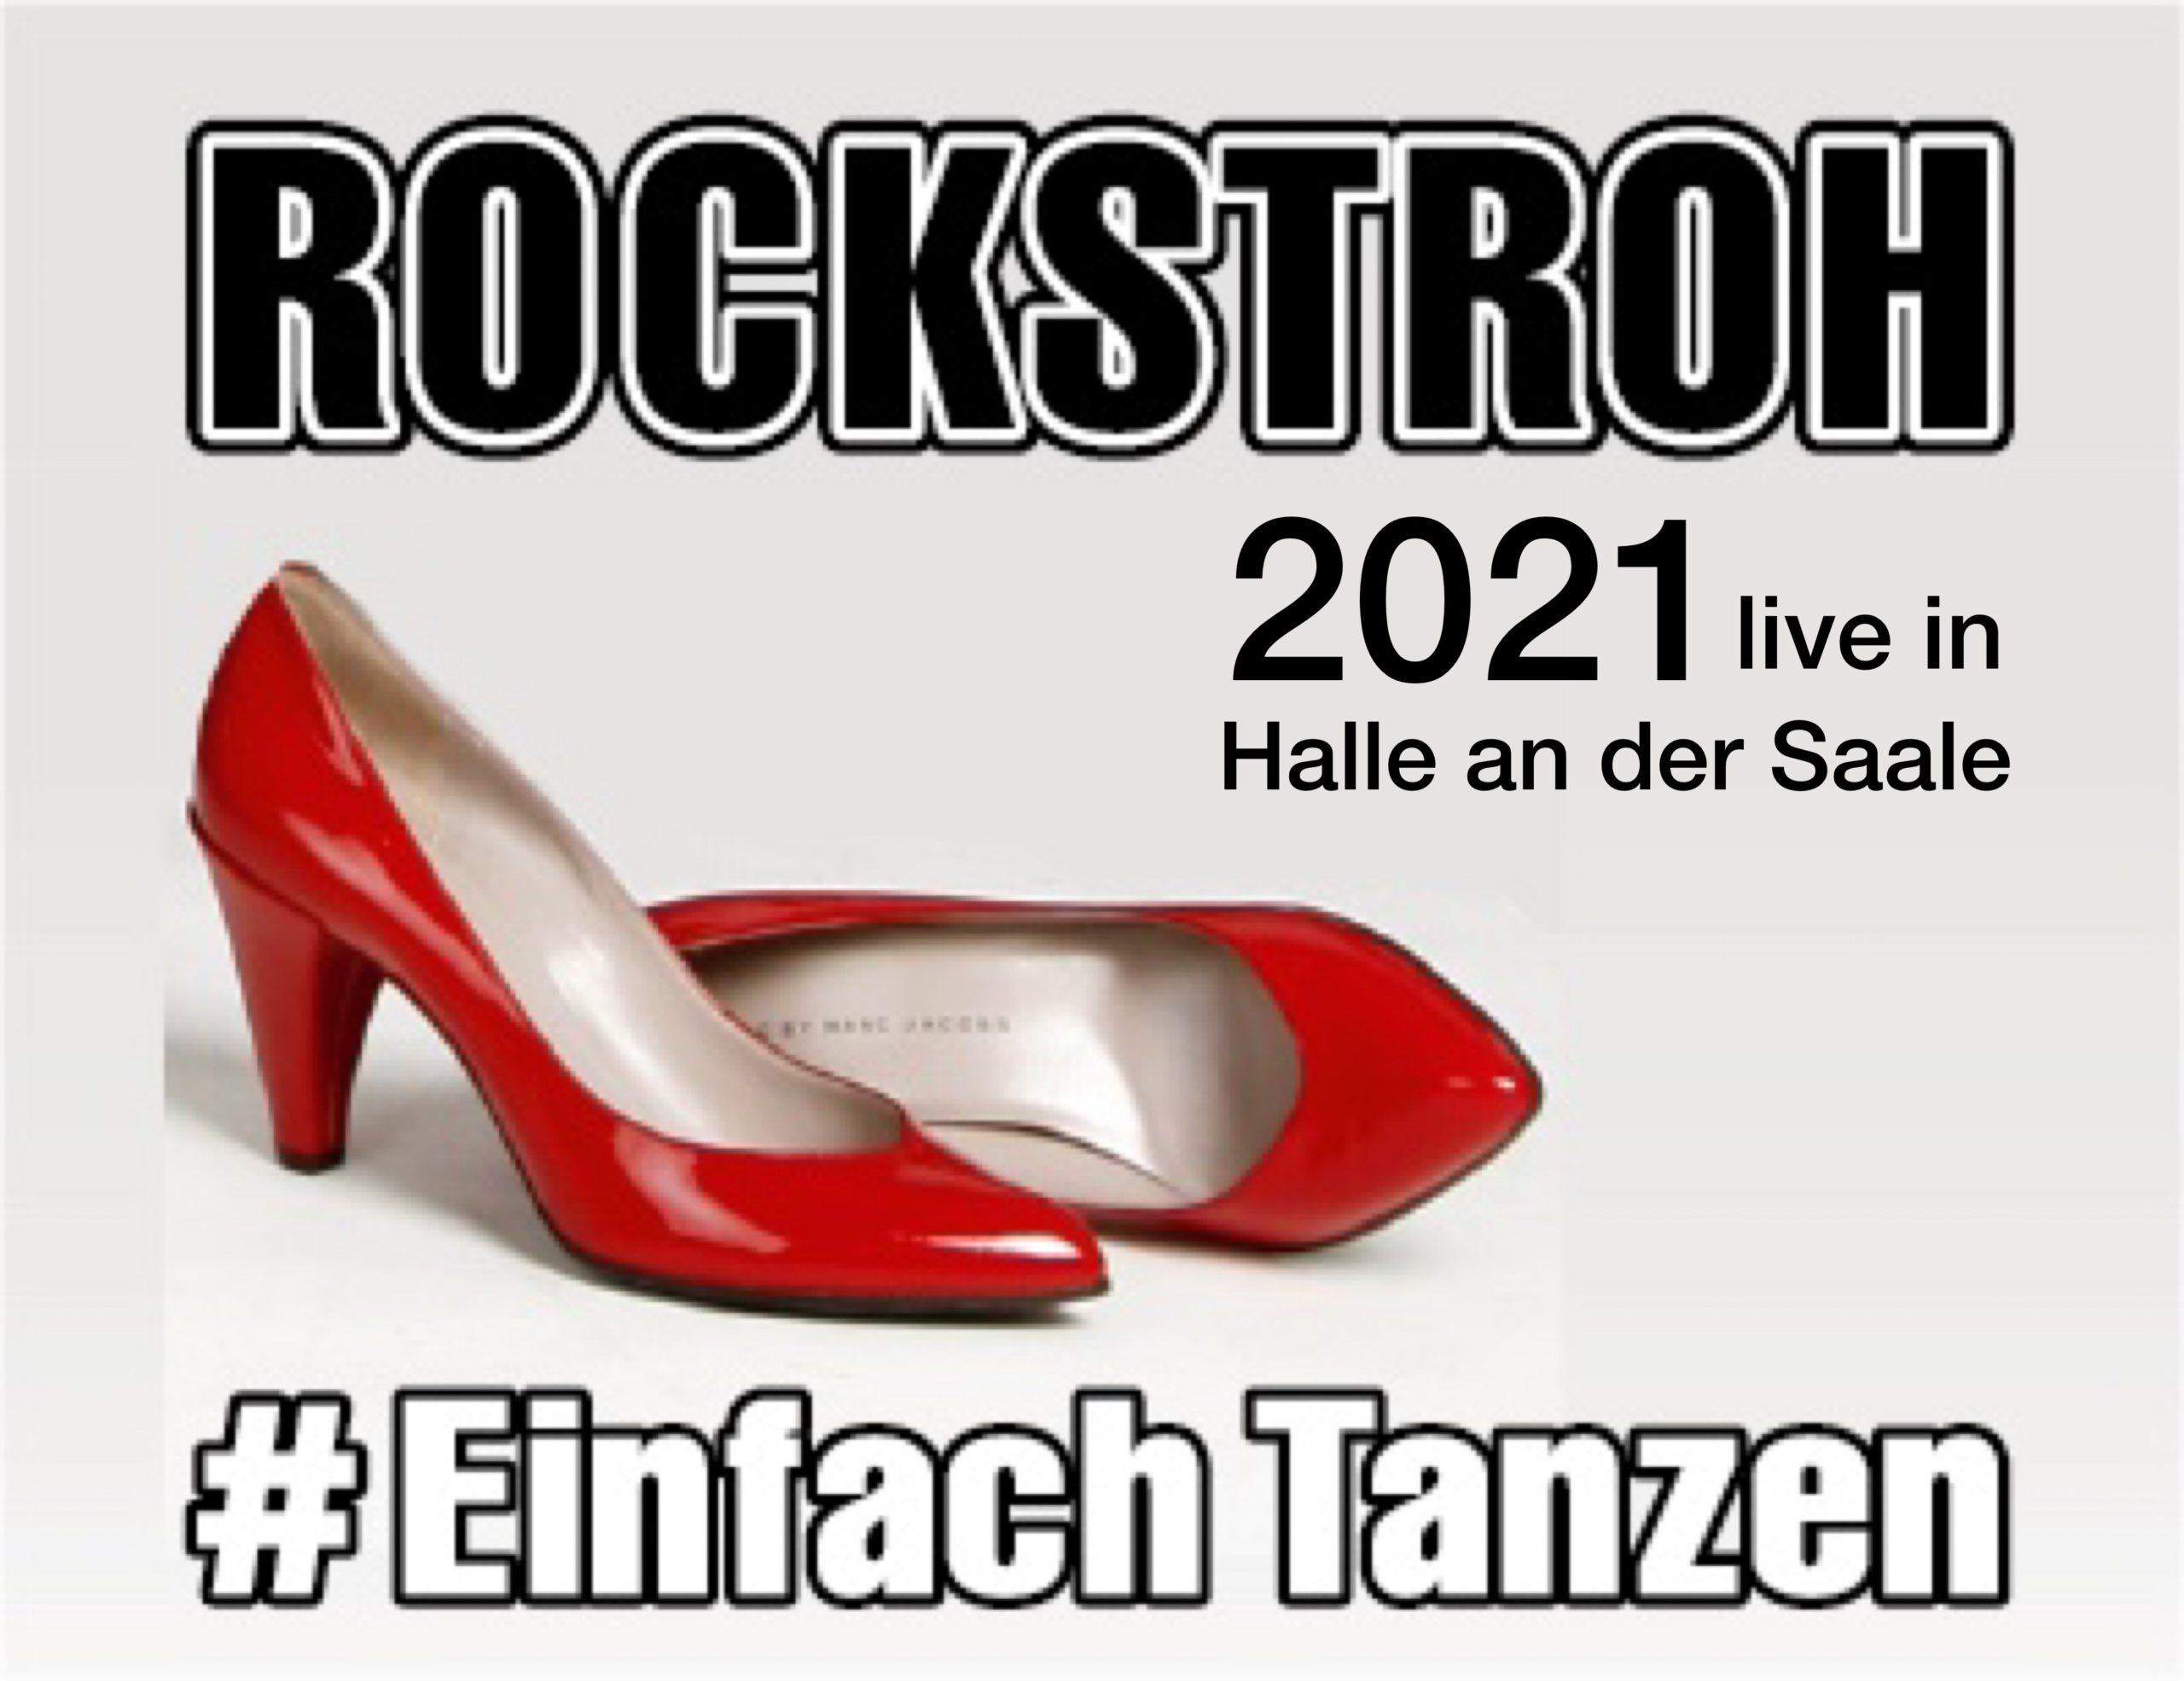 Rockstroh 2021